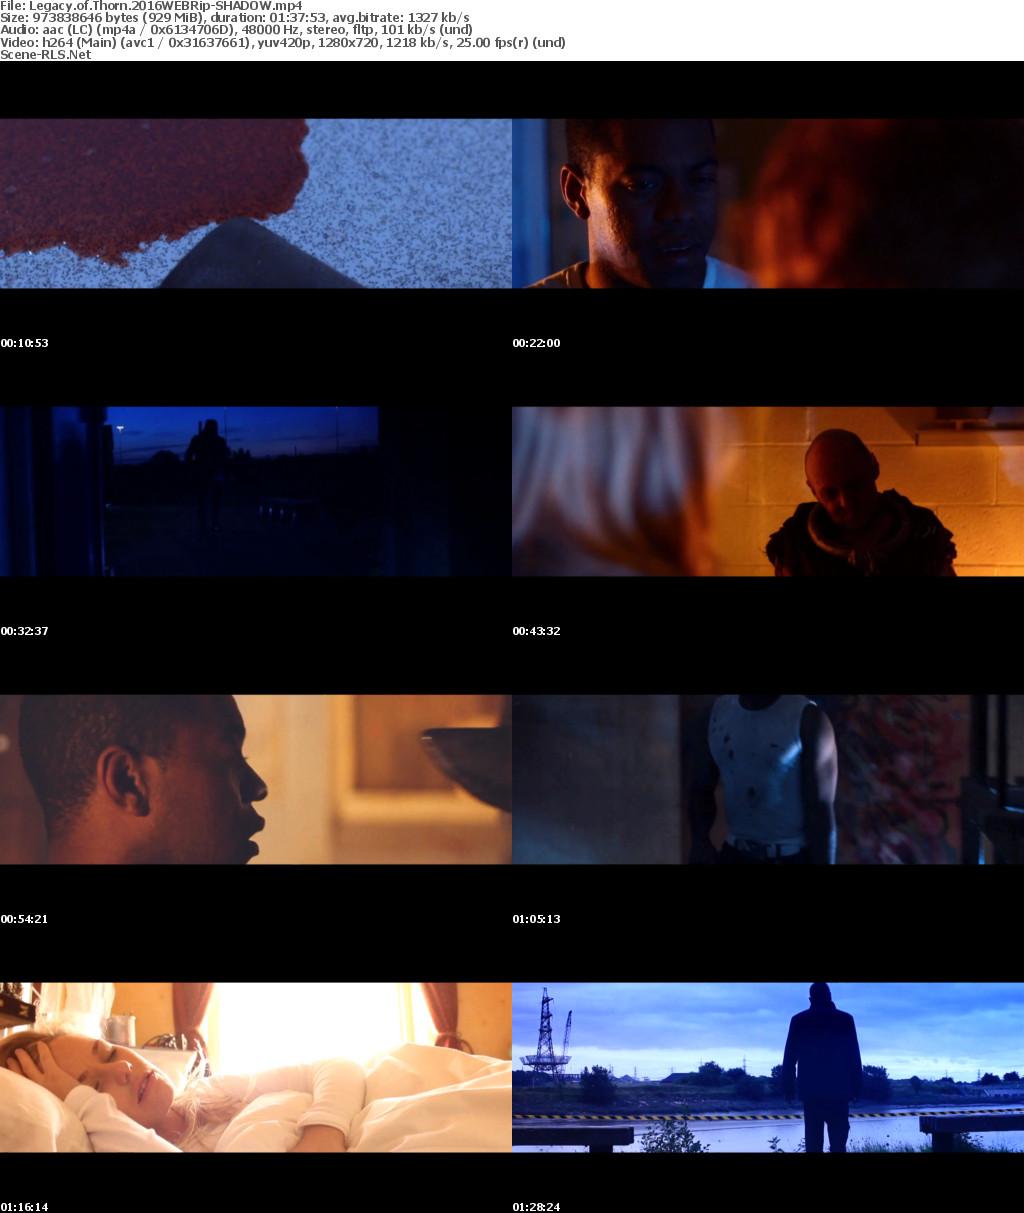 legacy of thorn 2016 webrip shadow - scene release